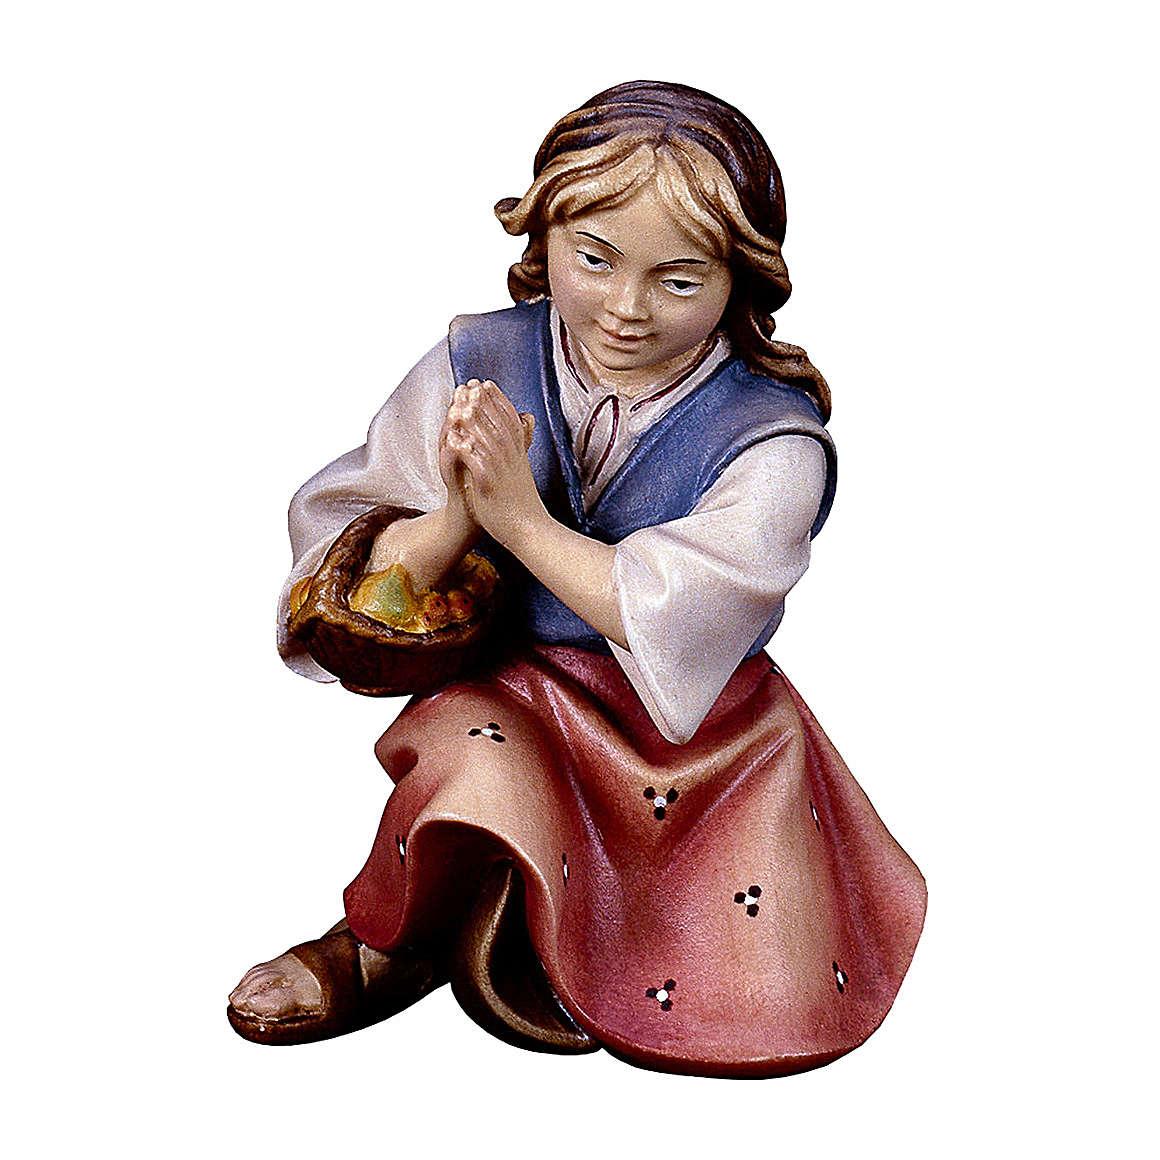 Bambina che prega inginocchiata per presepe Original Pastore legno dipinto in Valgardena 10 cm 4